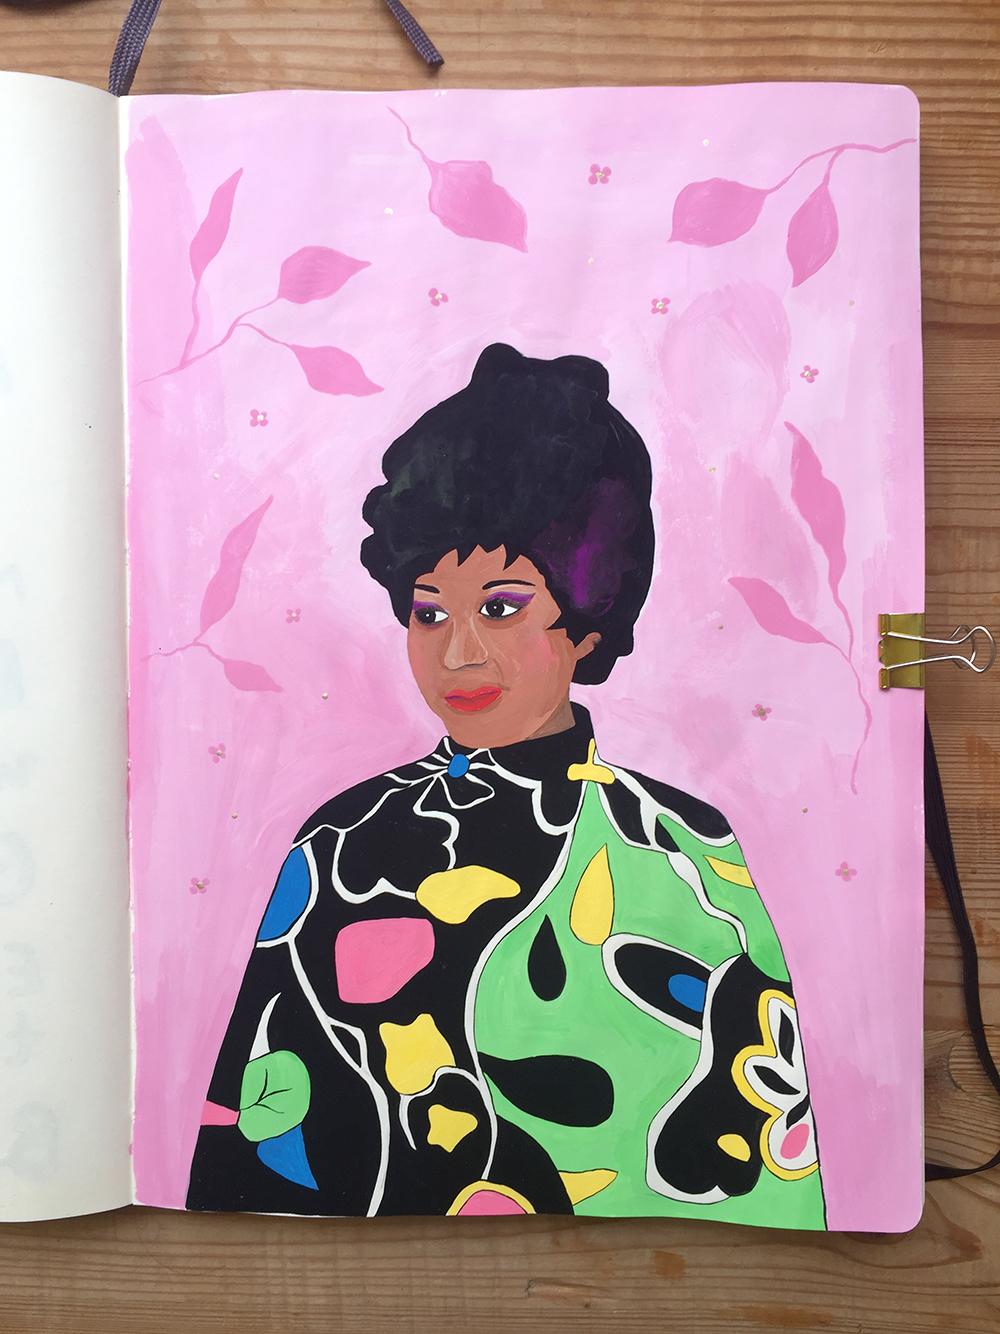 Aretha Franklin illustration by Marenthe